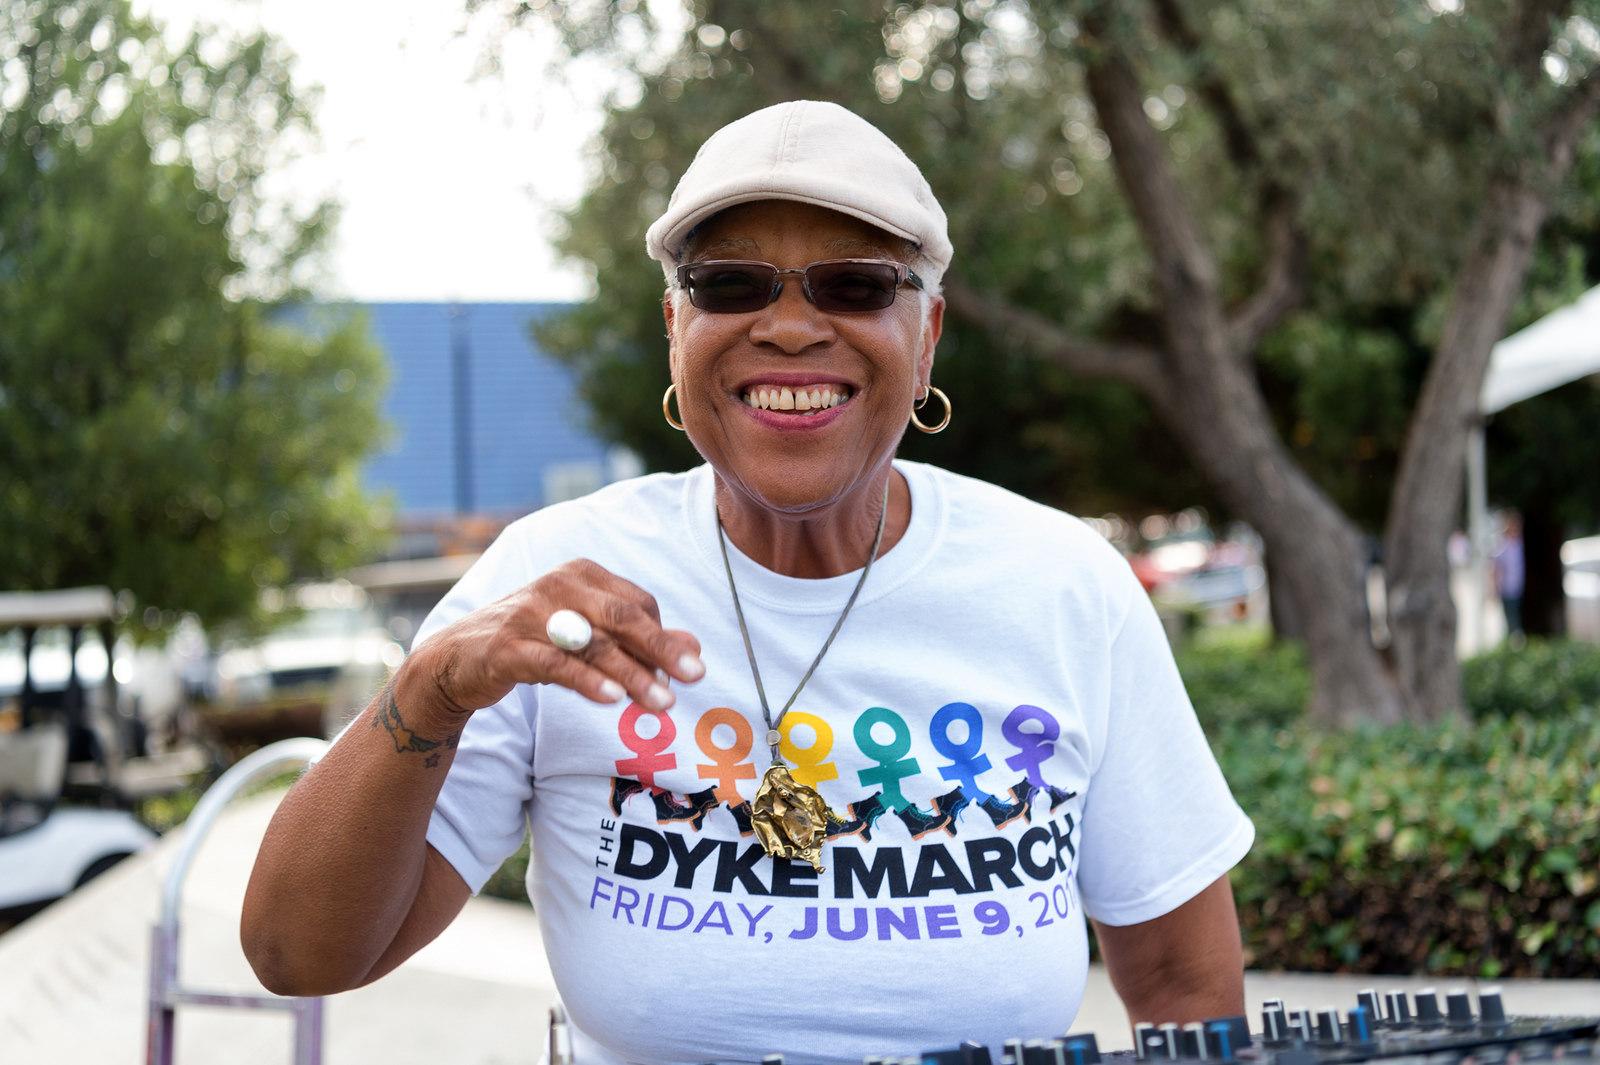 6-7-19 - Dyke March - photo credit Jon Viscott.jpg